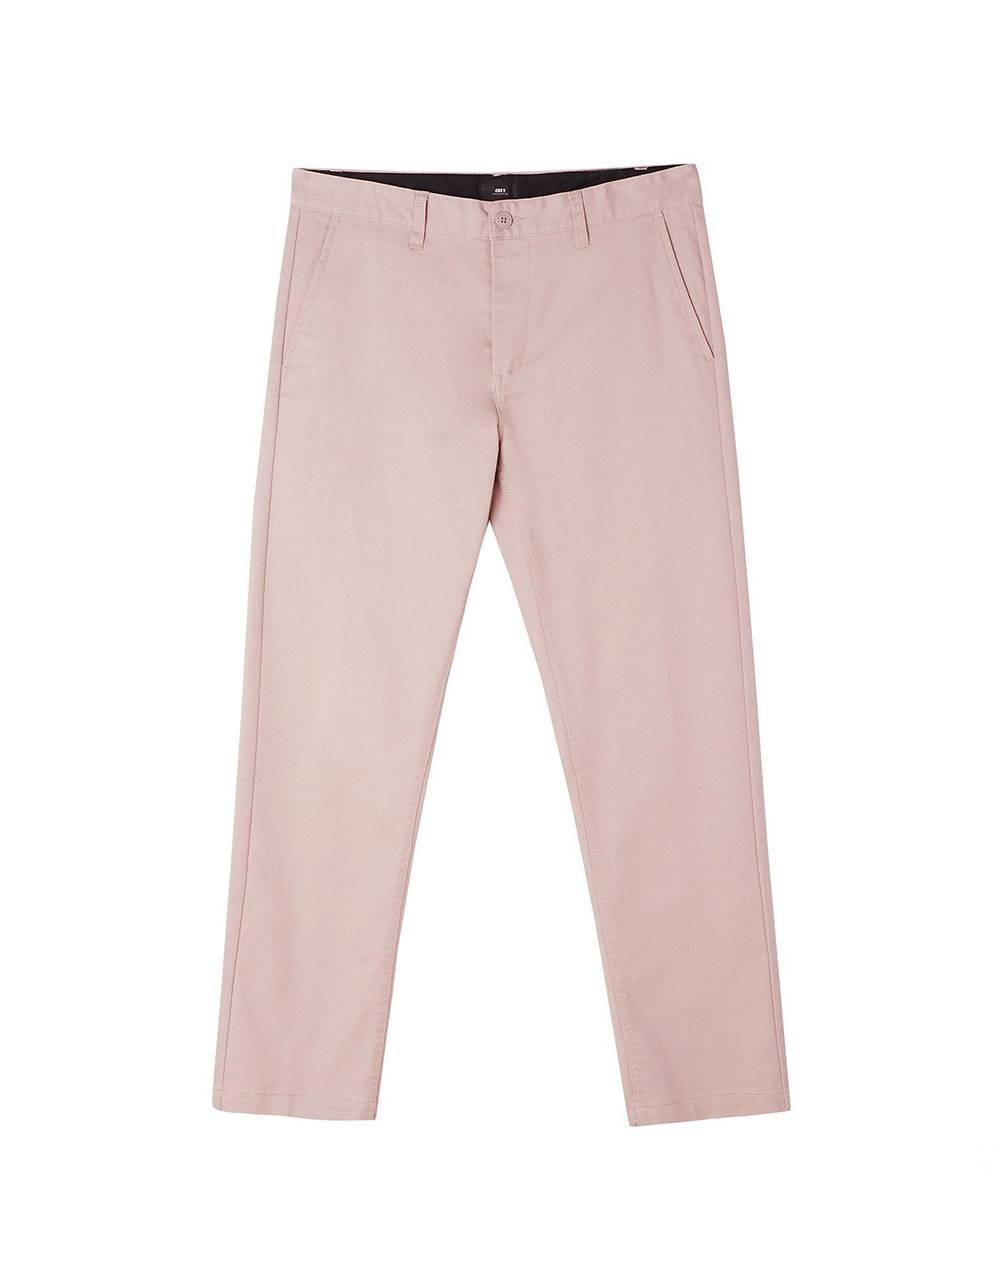 Obey Straggler pants - gallnut obey Pant 81,15€